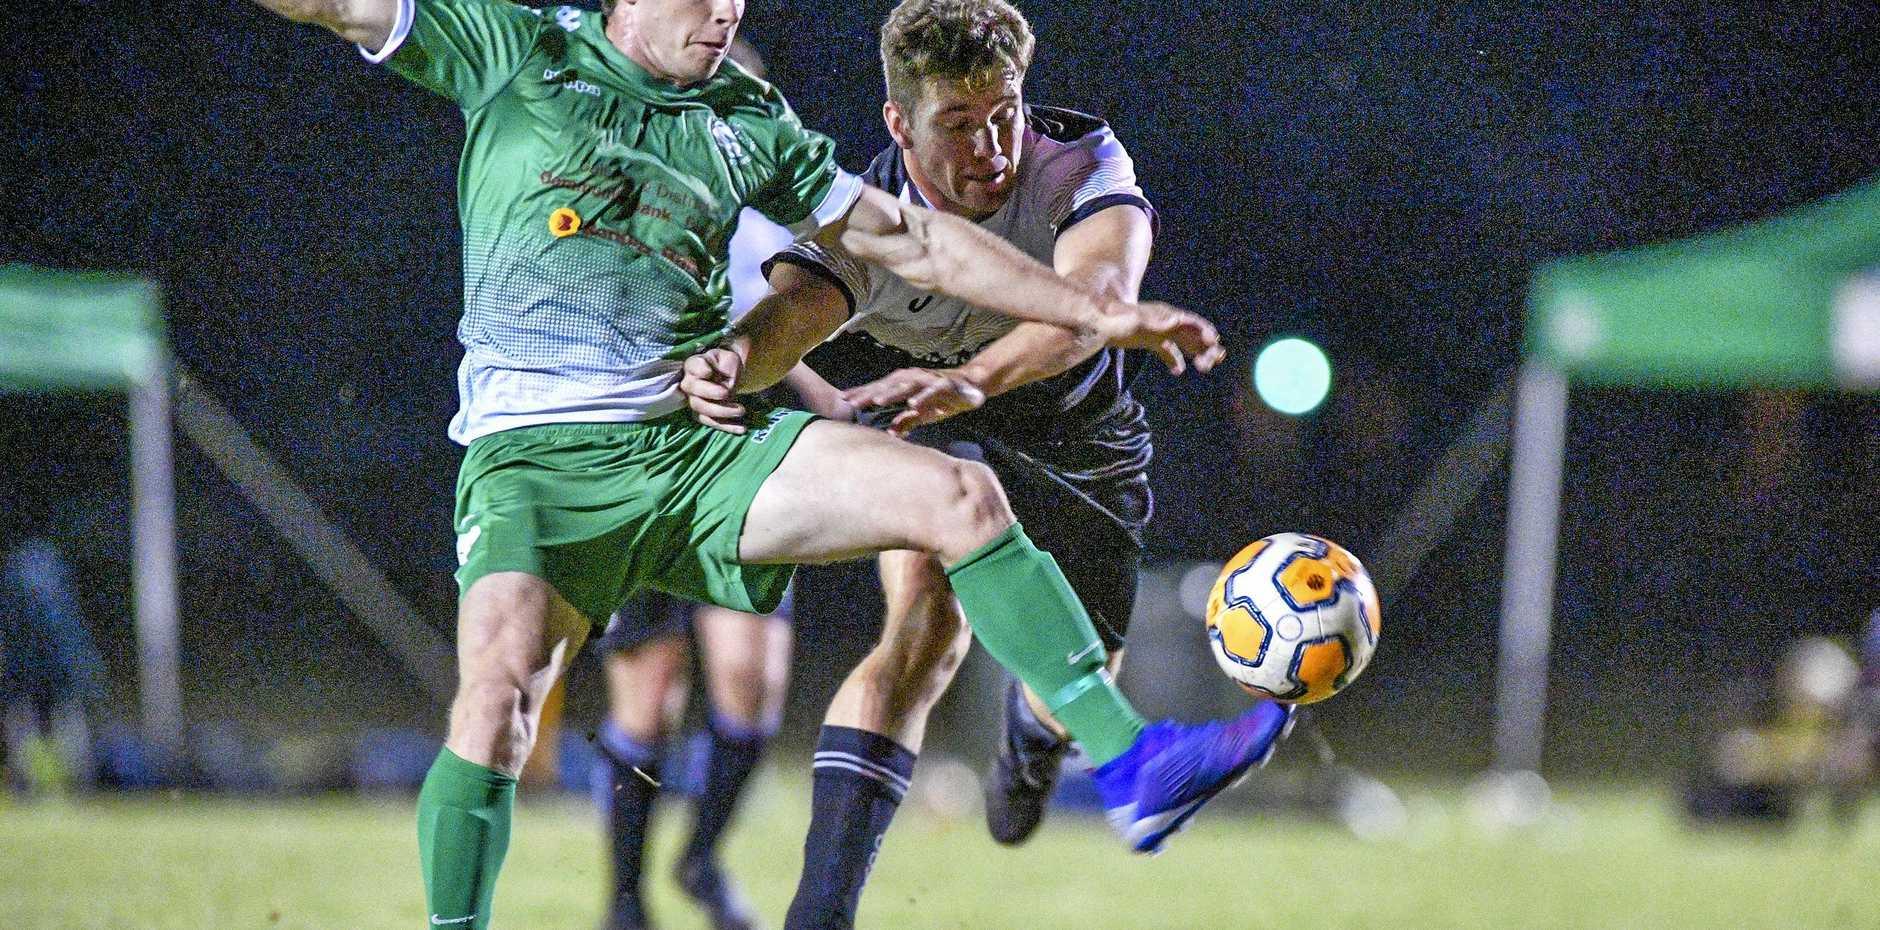 Clinton FC's Samuel Roberts gets a pass way under heavy pressure from Central FC's Adam Eiseman last weekend.